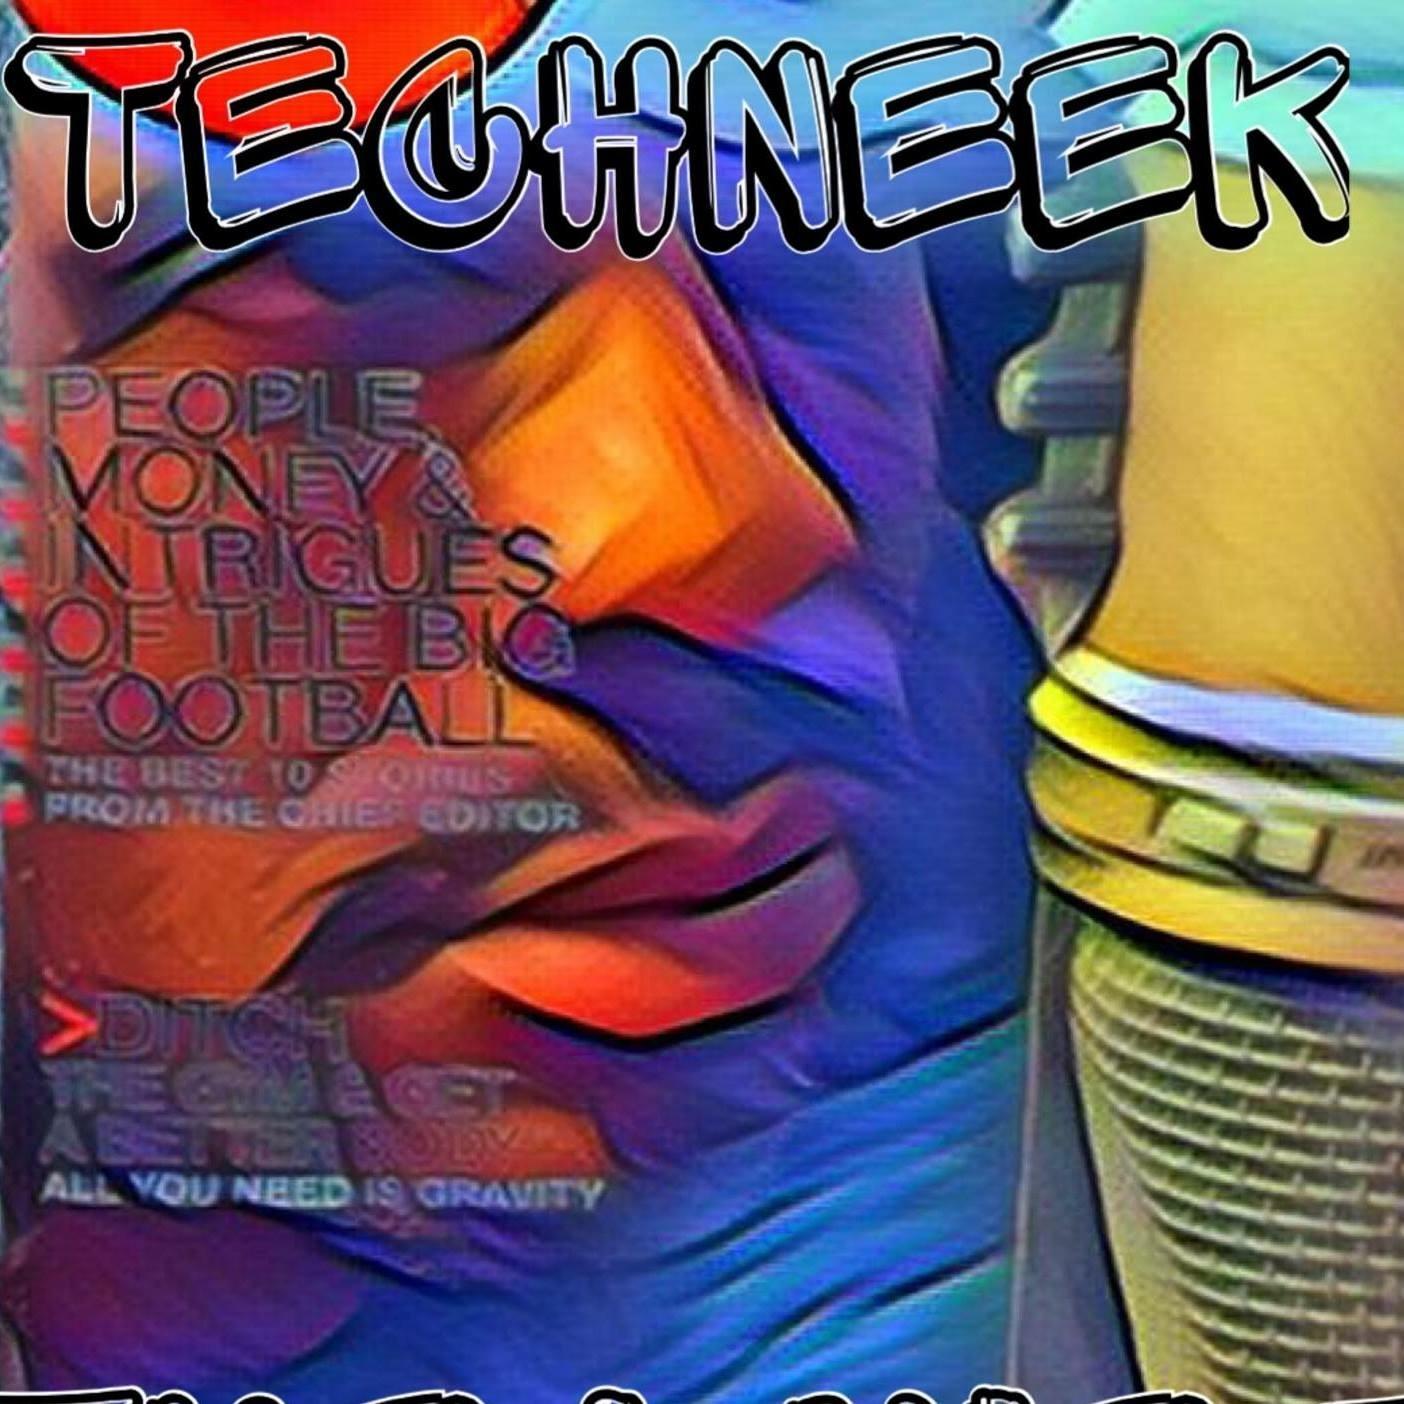 Techneek  Love Zone